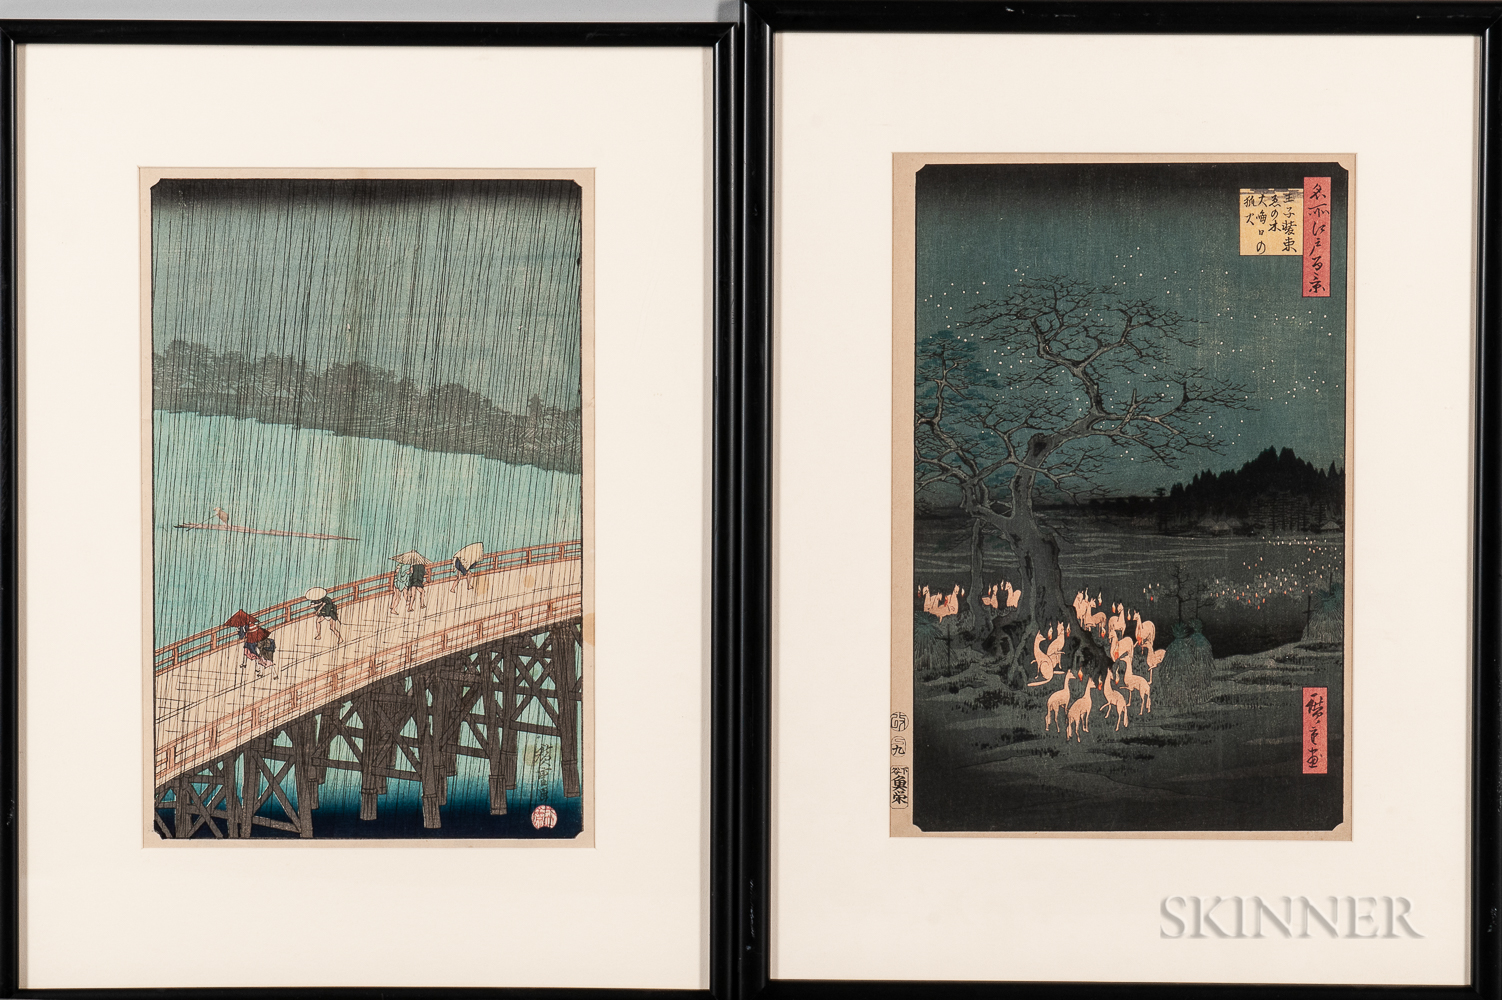 Utagawa Hiroshige (1797-1858), Two Woodblock Prints